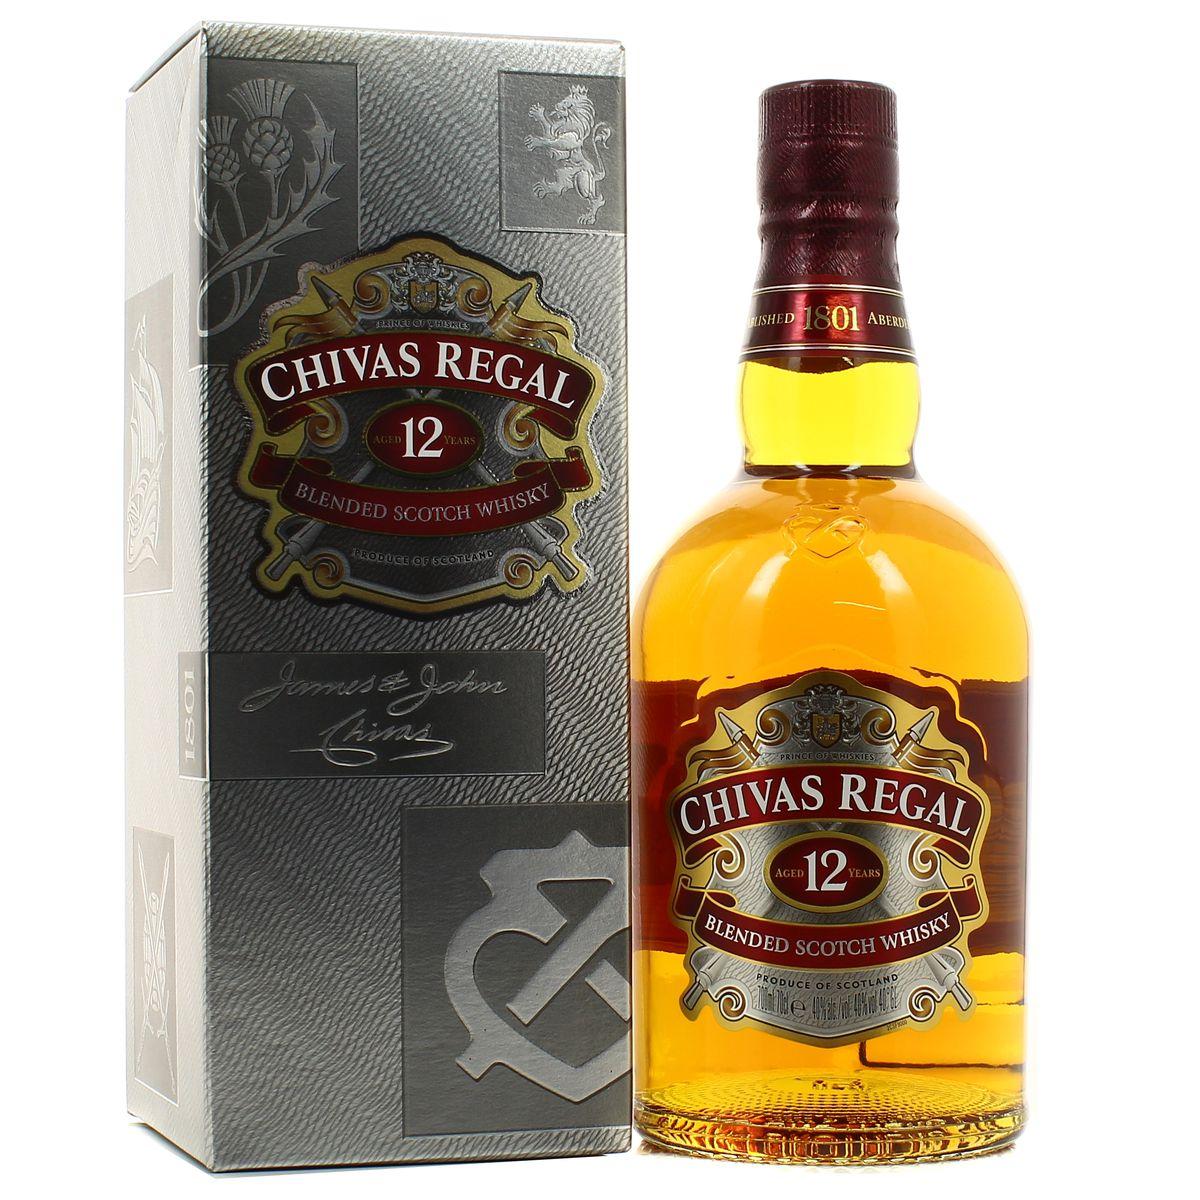 25dcdbfa3e24 Chivas Regal Blended scotch whisky 12 ans 40°, 70cl : houra.fr